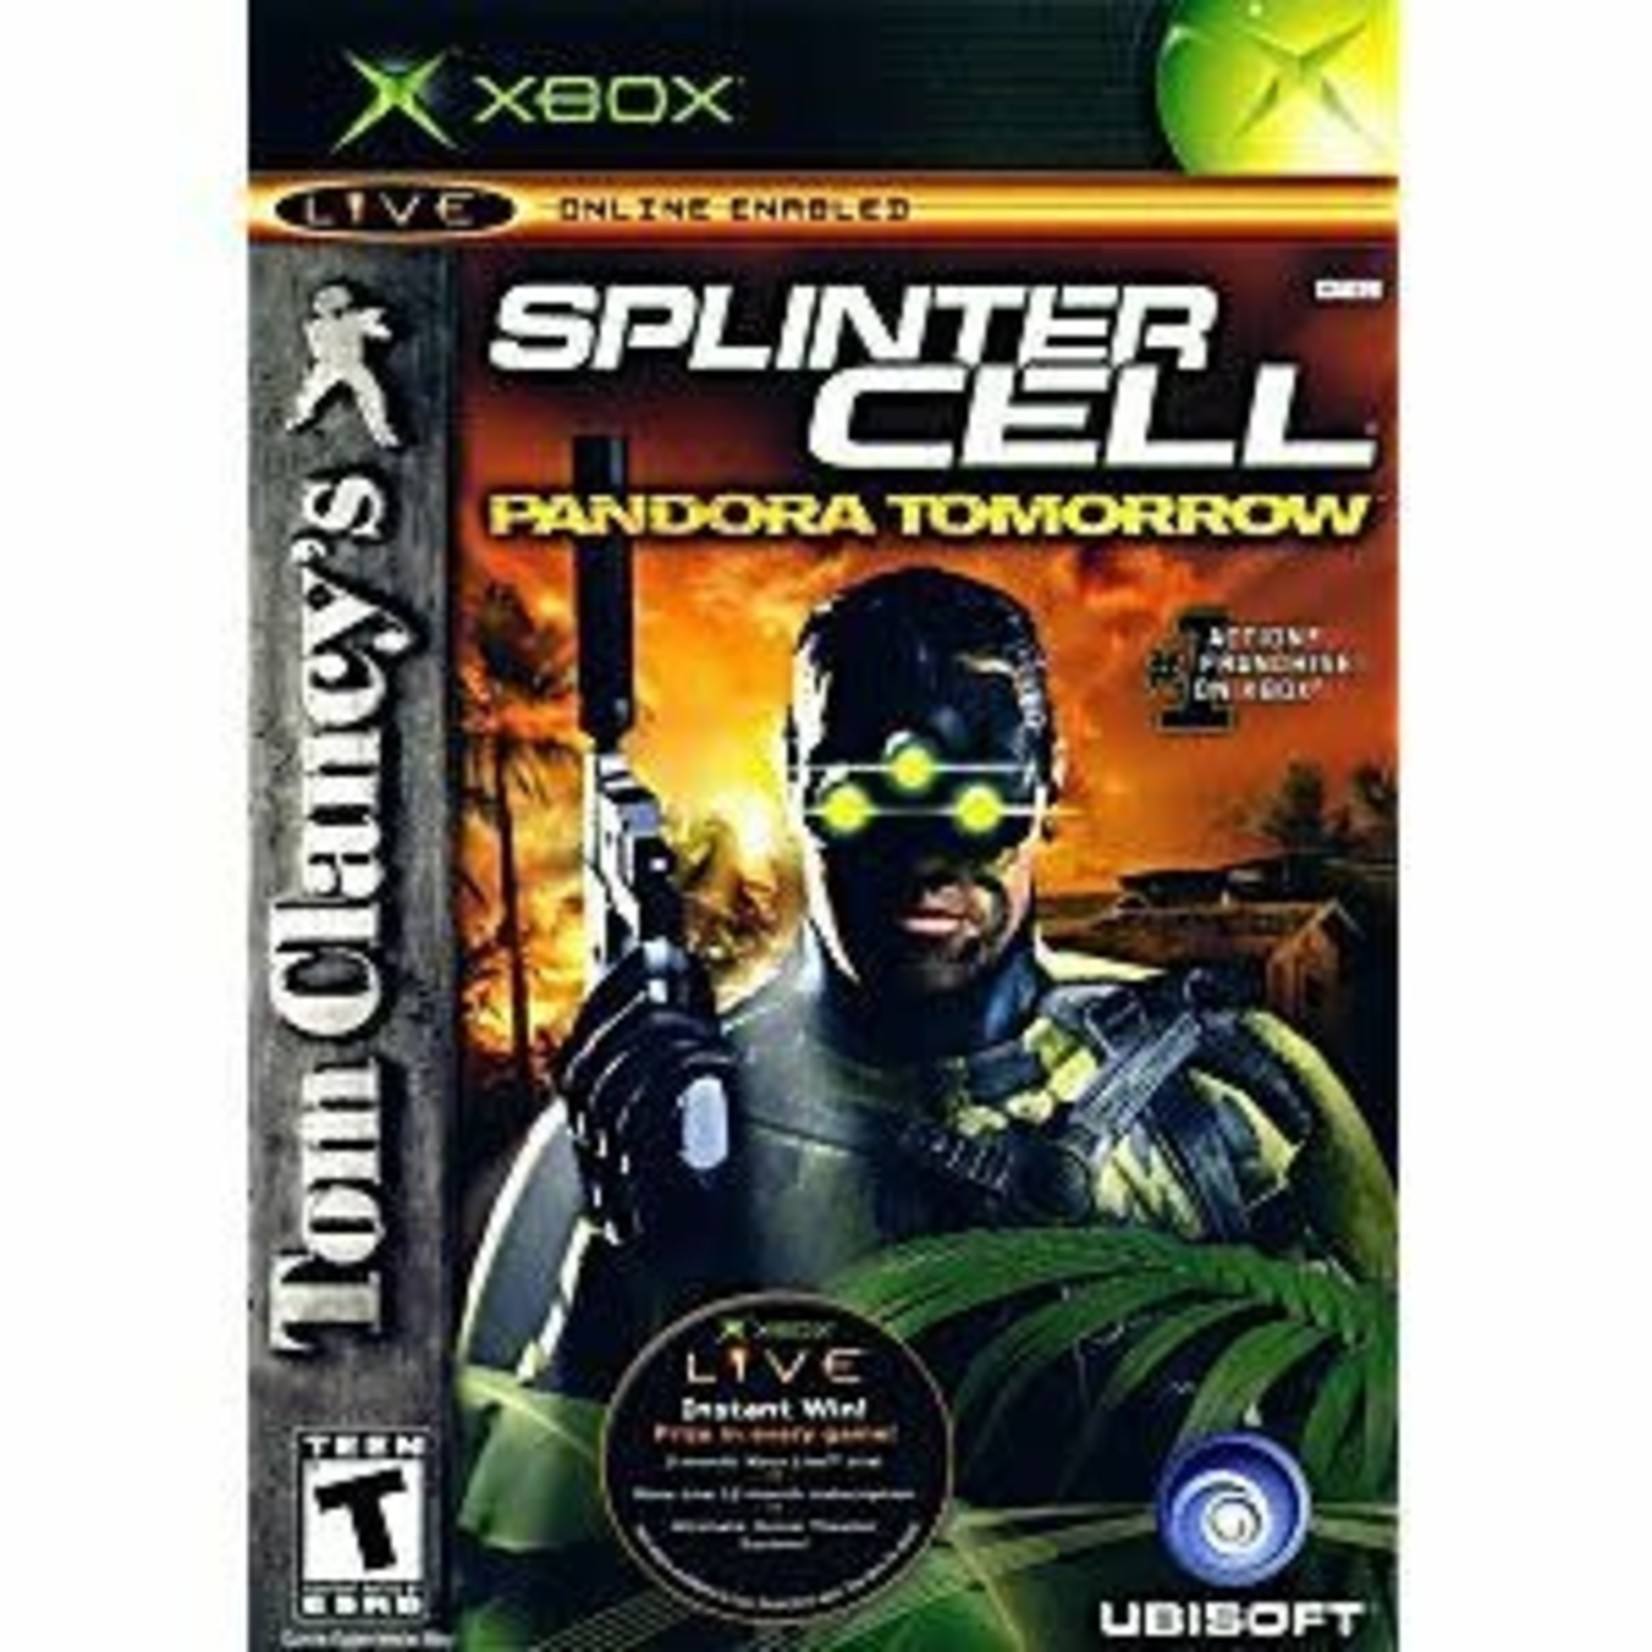 XBU-Splinter Cell Pandora Tomorrow